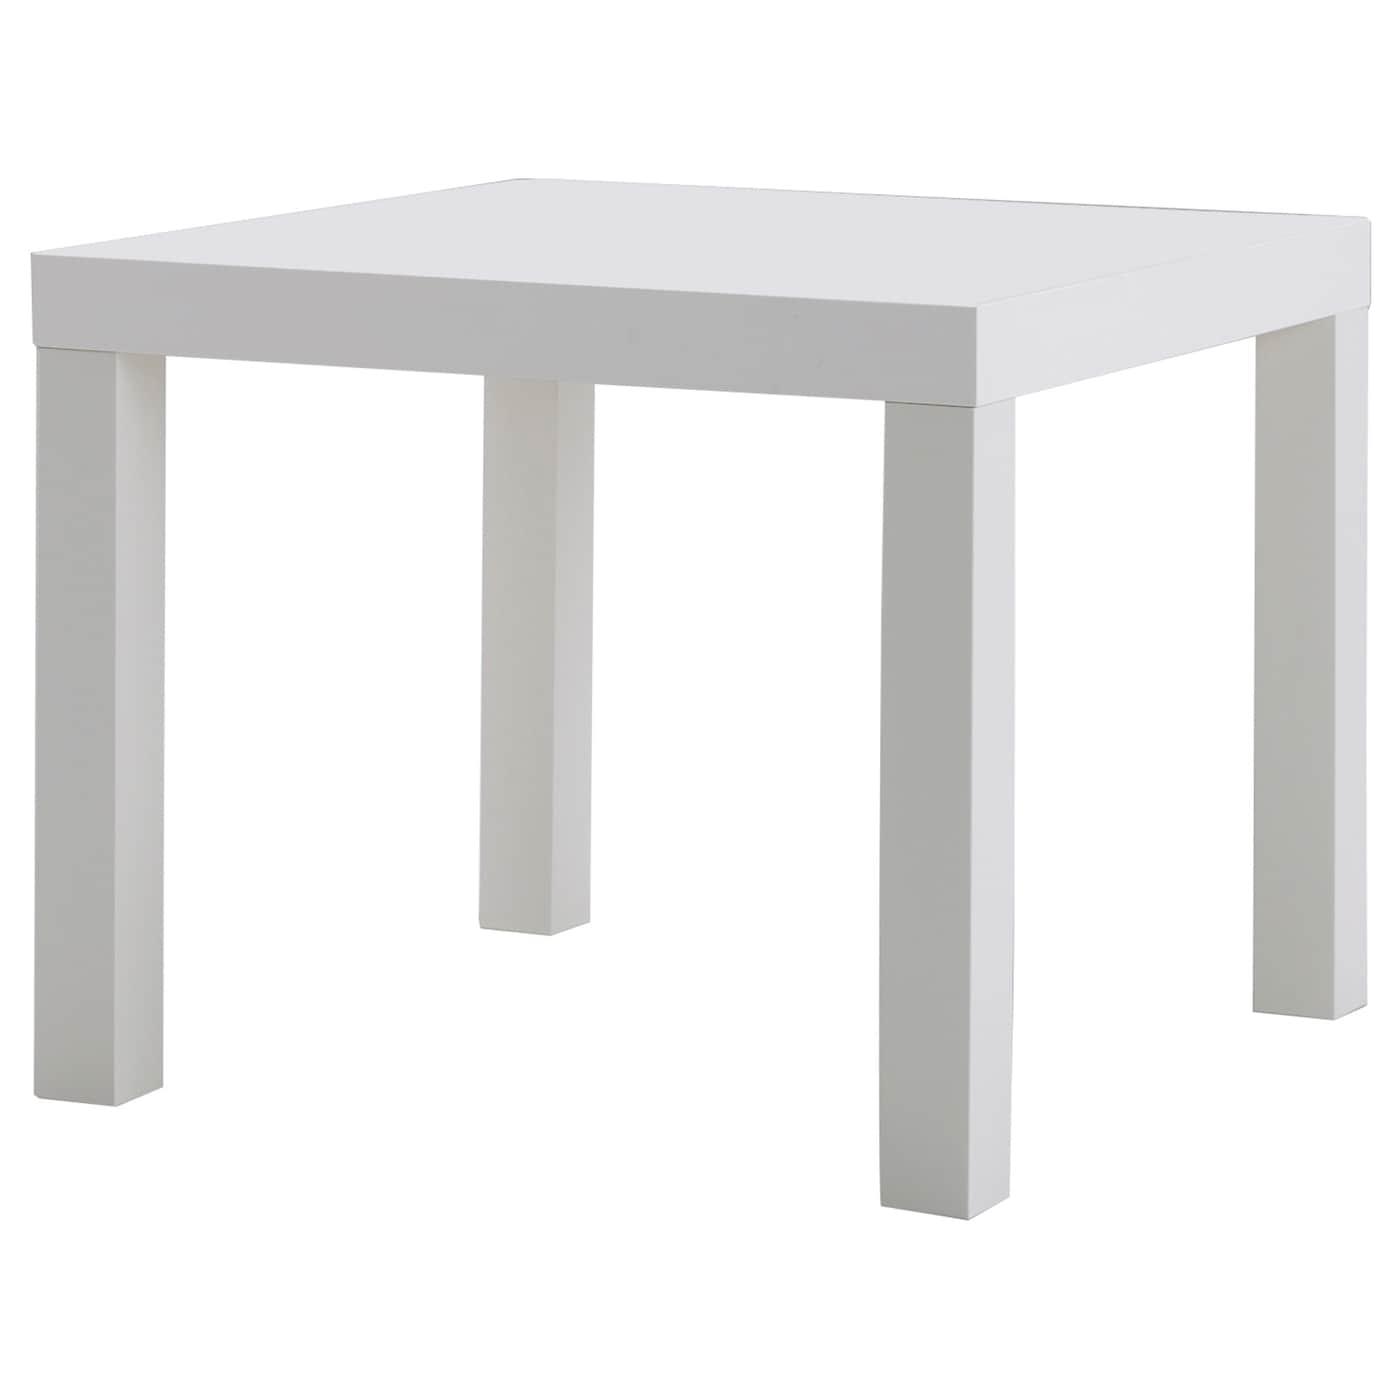 Lack mesa auxiliar blanco 55 x 55 cm ikea - Ikea mesa lack blanca ...